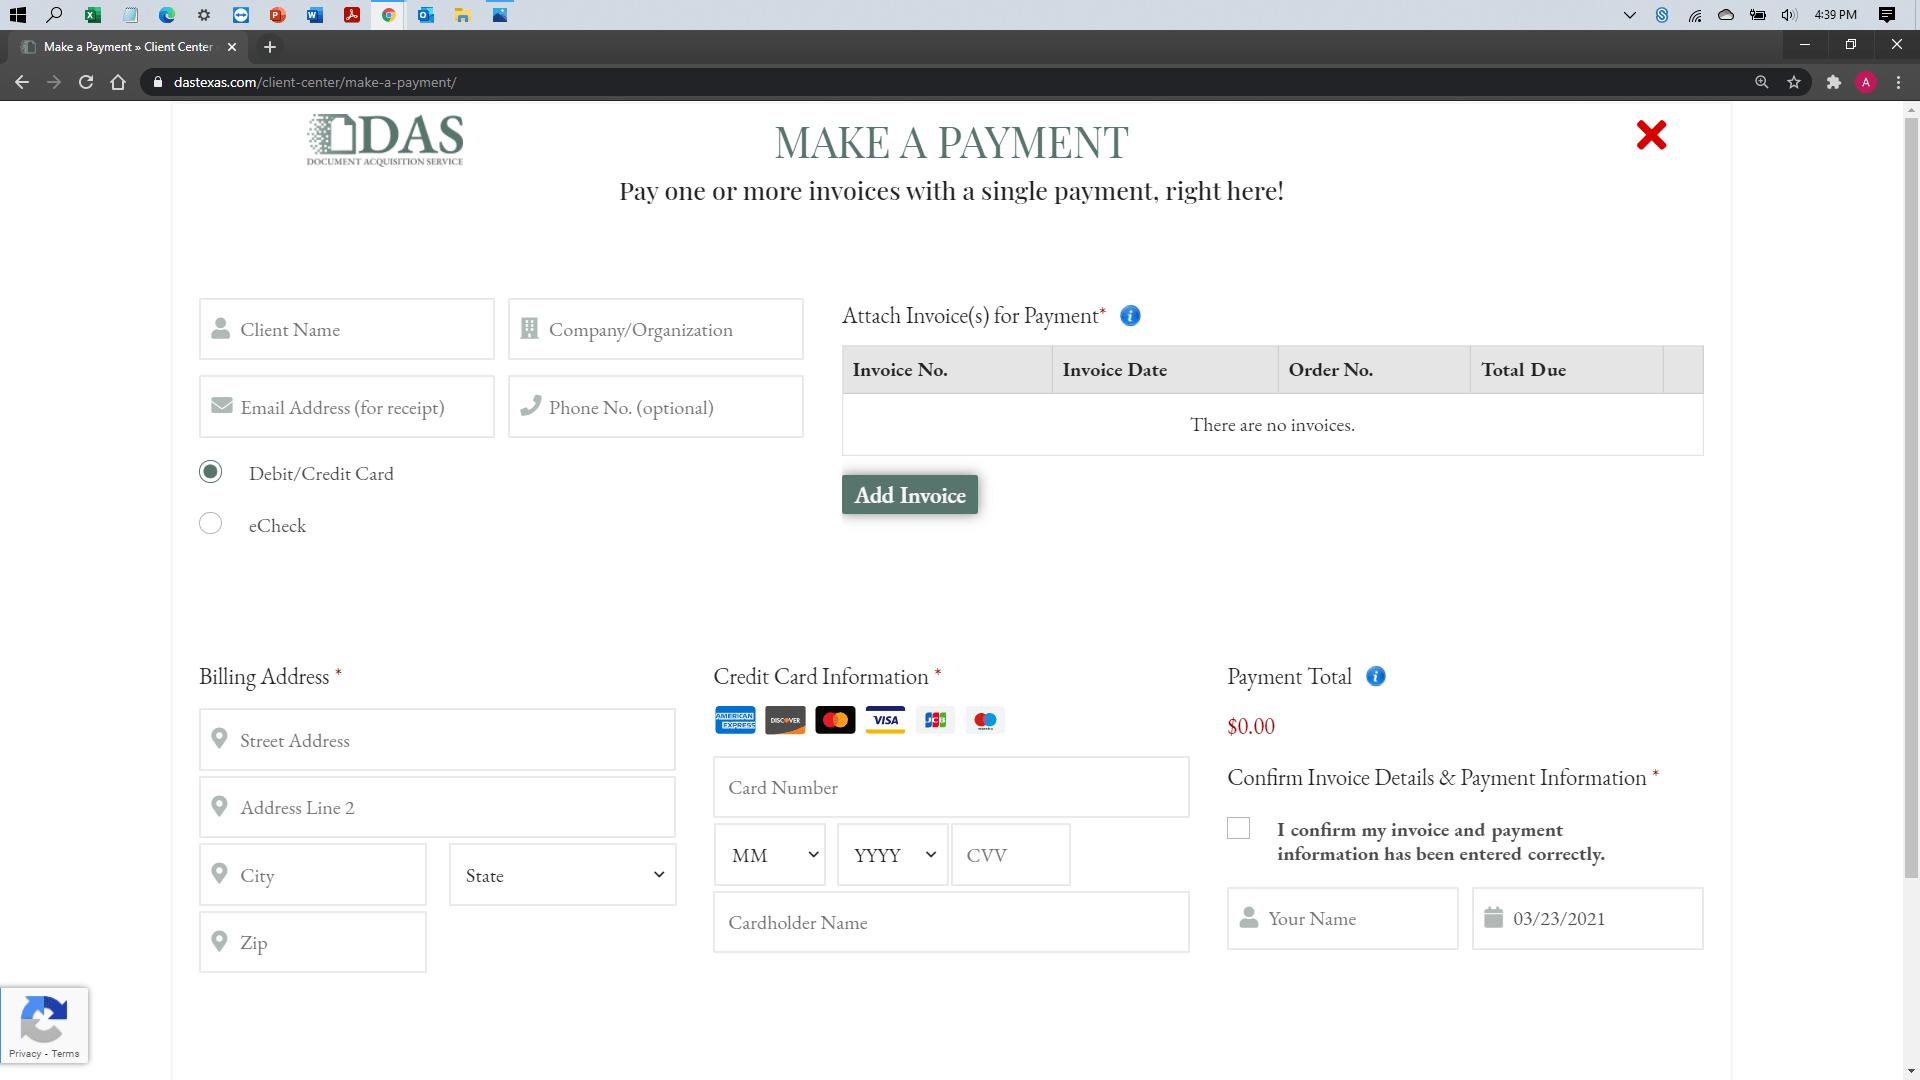 [help docs] Make a Payment - Credit Debit - Blank